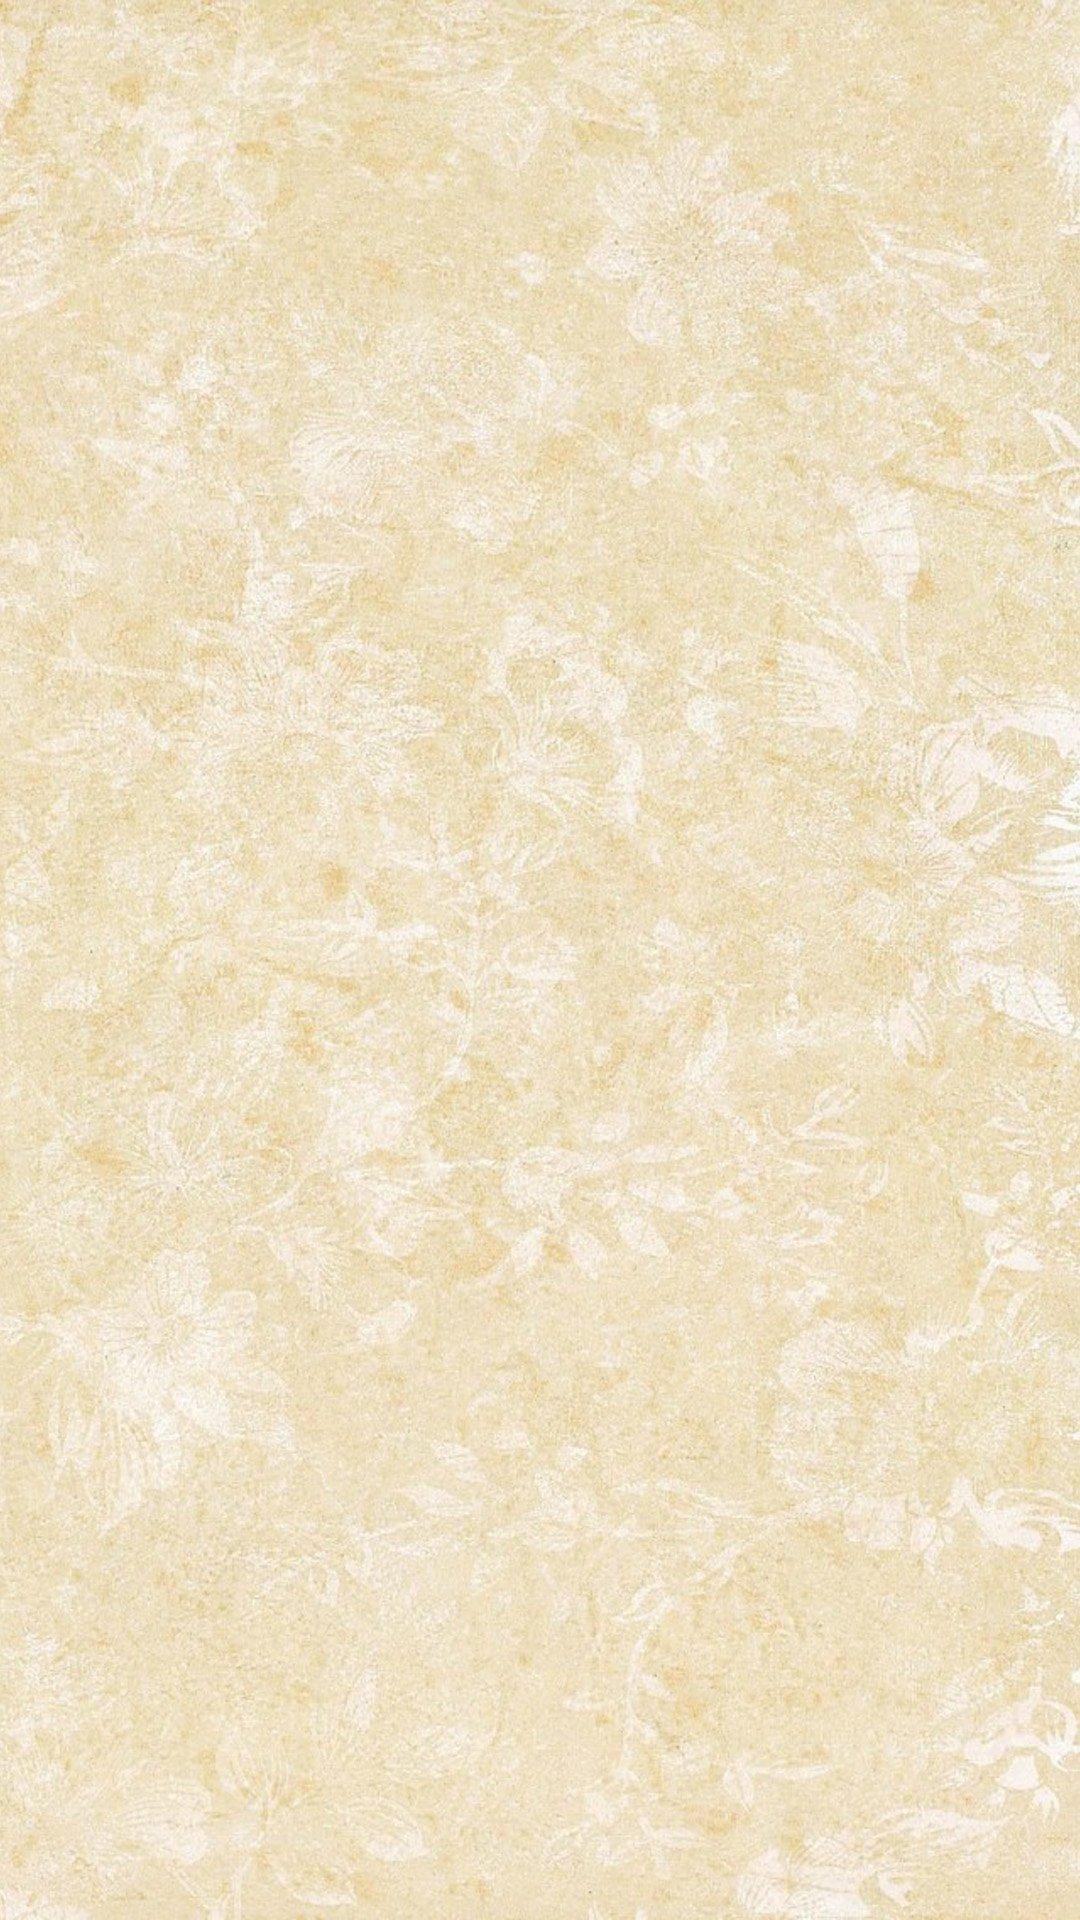 White flower texture iphone 6 plus wallpaper iPhone 6 Plus Wallpaper 1080x1920